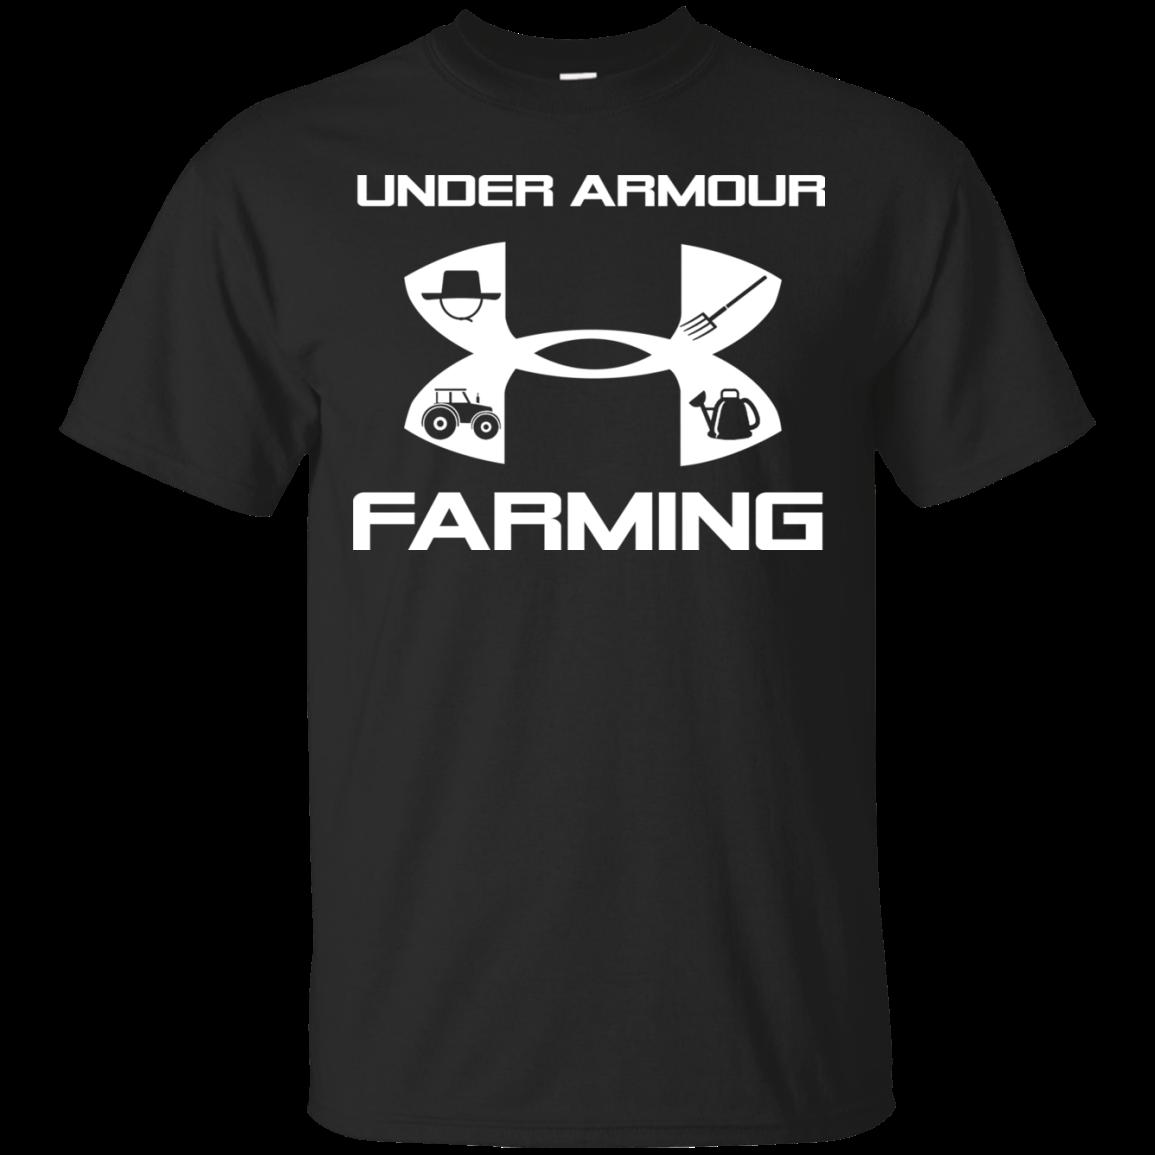 0886426fa Under Armour T shirts Farming Hoodies Sweatshirts | Men's t shirts ...